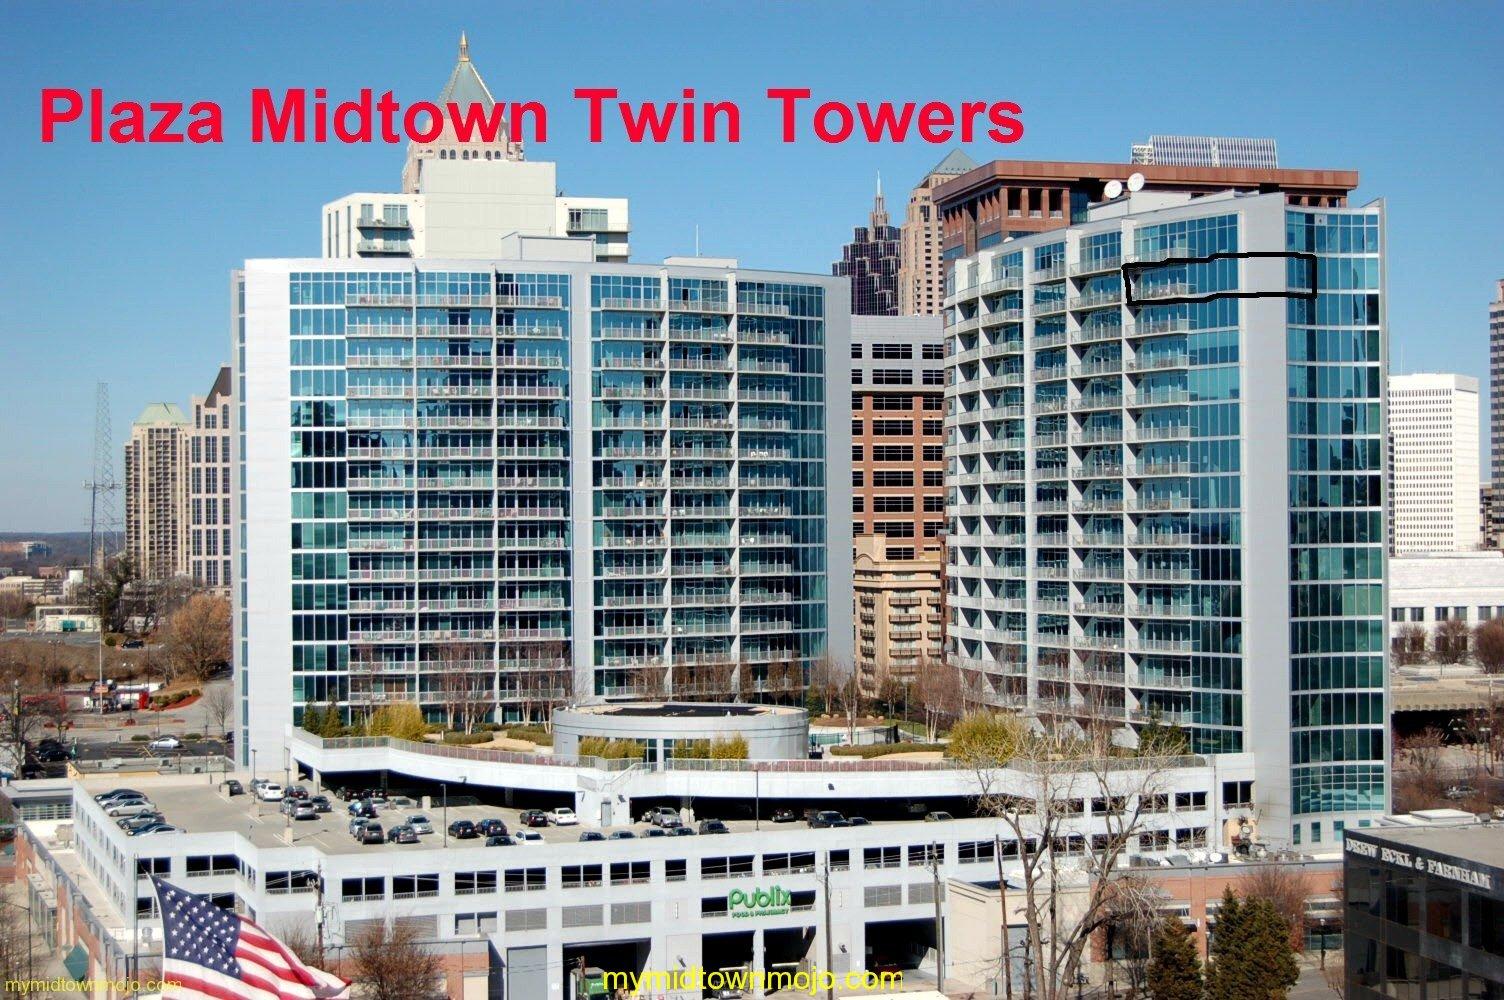 plaza-midtown-twin-towers